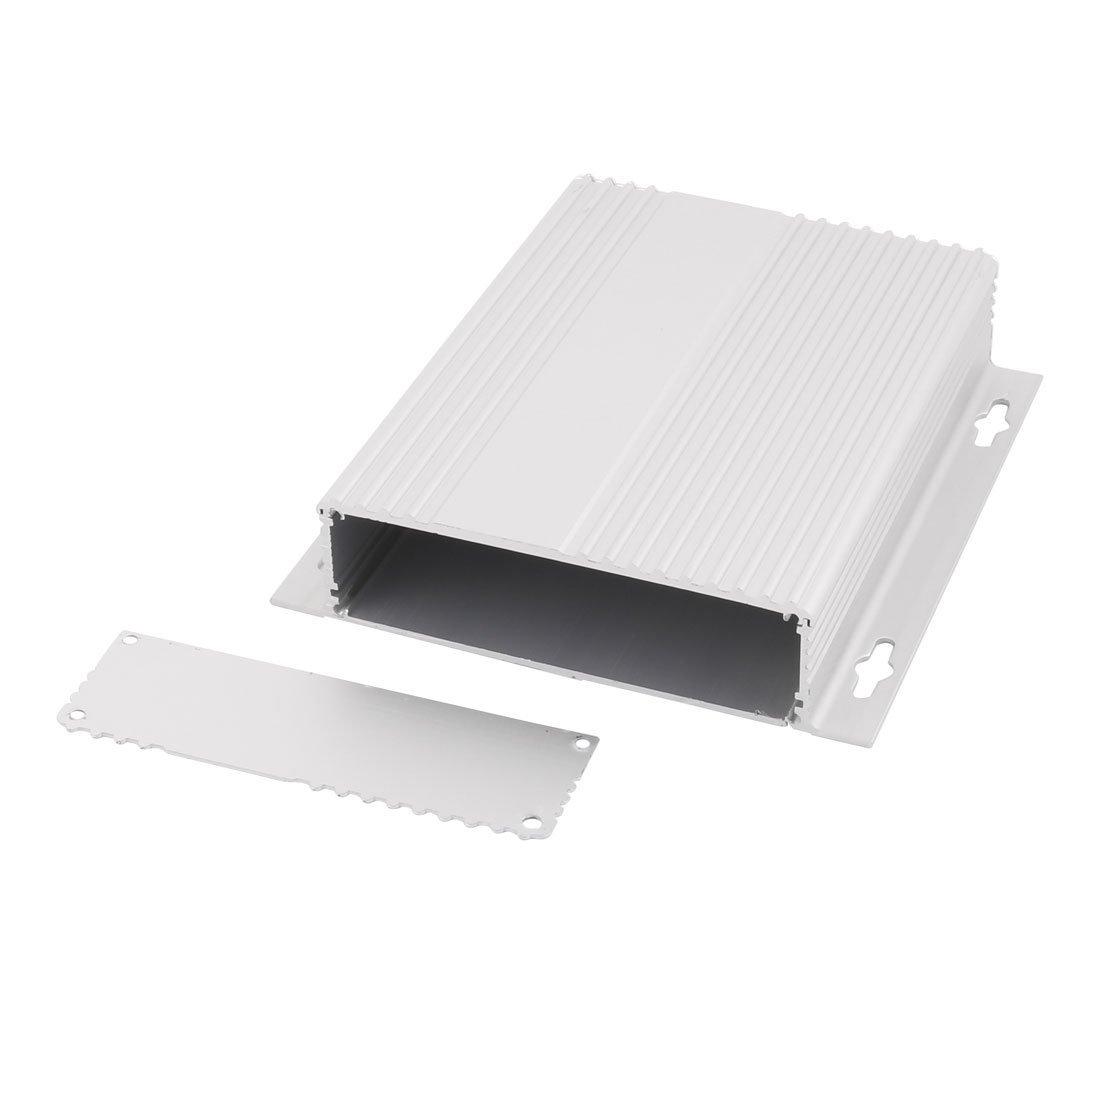 Amazon.com: eDealMax 36 x 147 x 155 mm multiusos de aluminio extruido carcasa de la caja de Plata del tono: Electronics